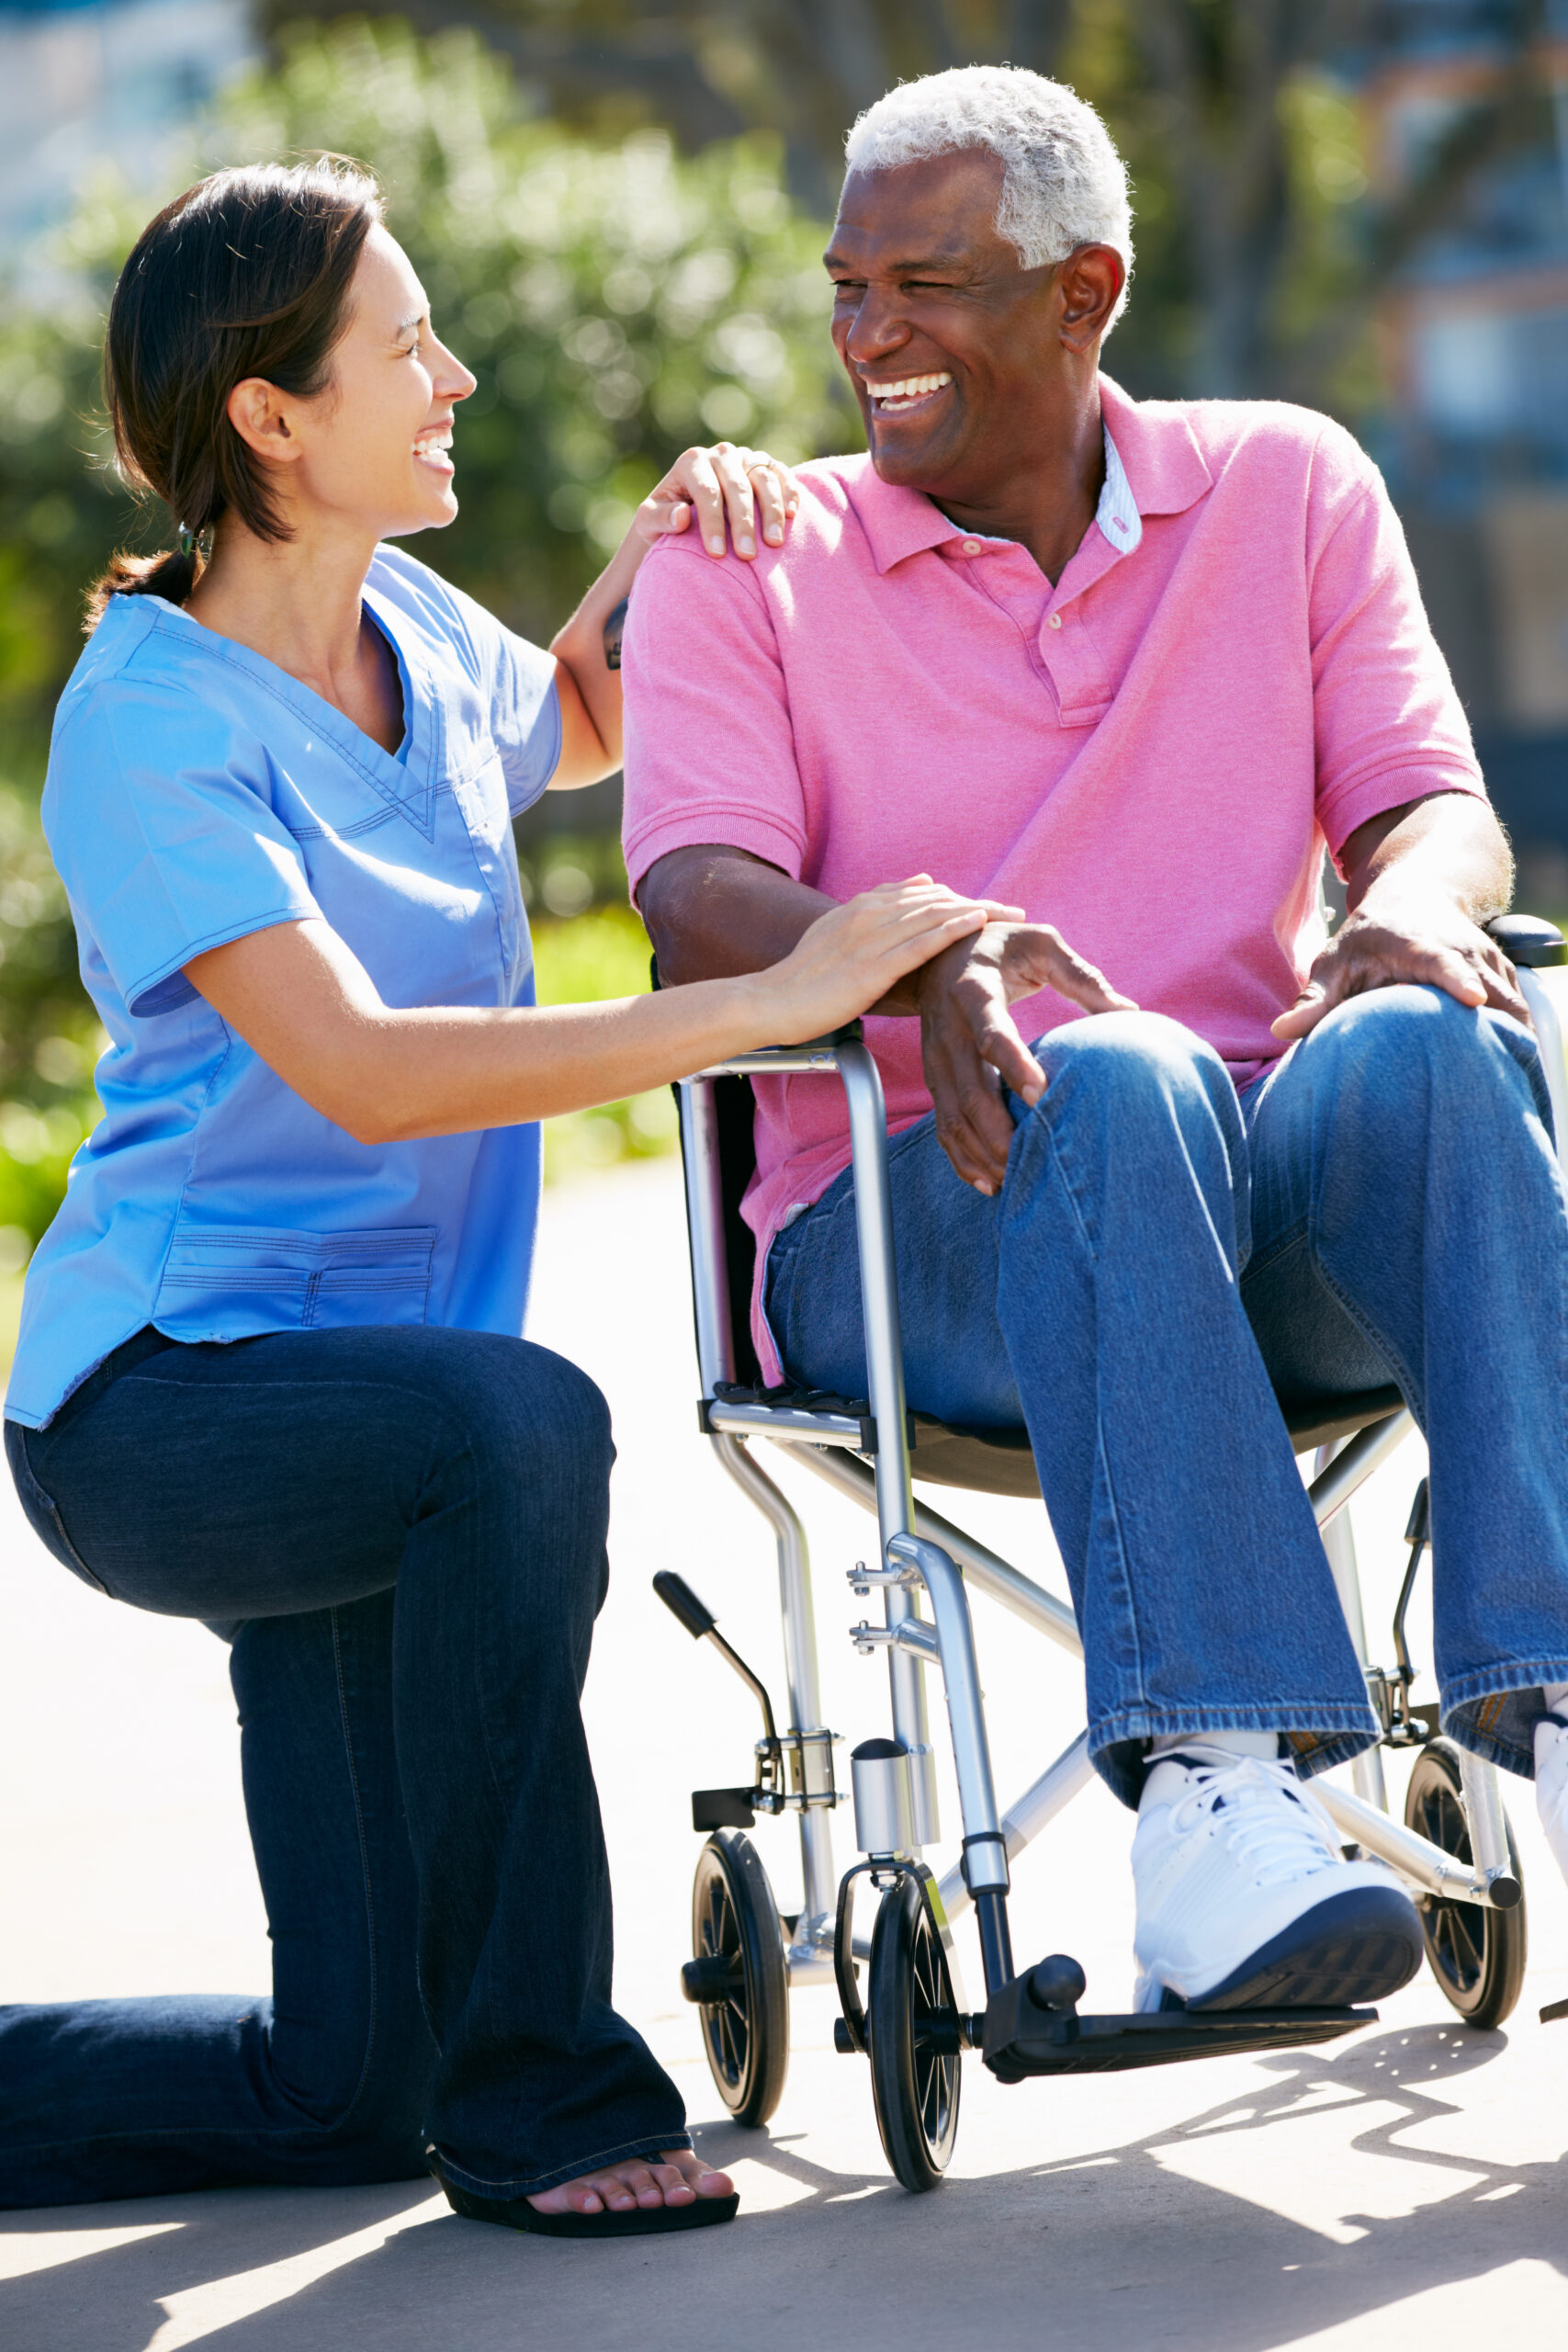 Caregiver and Man